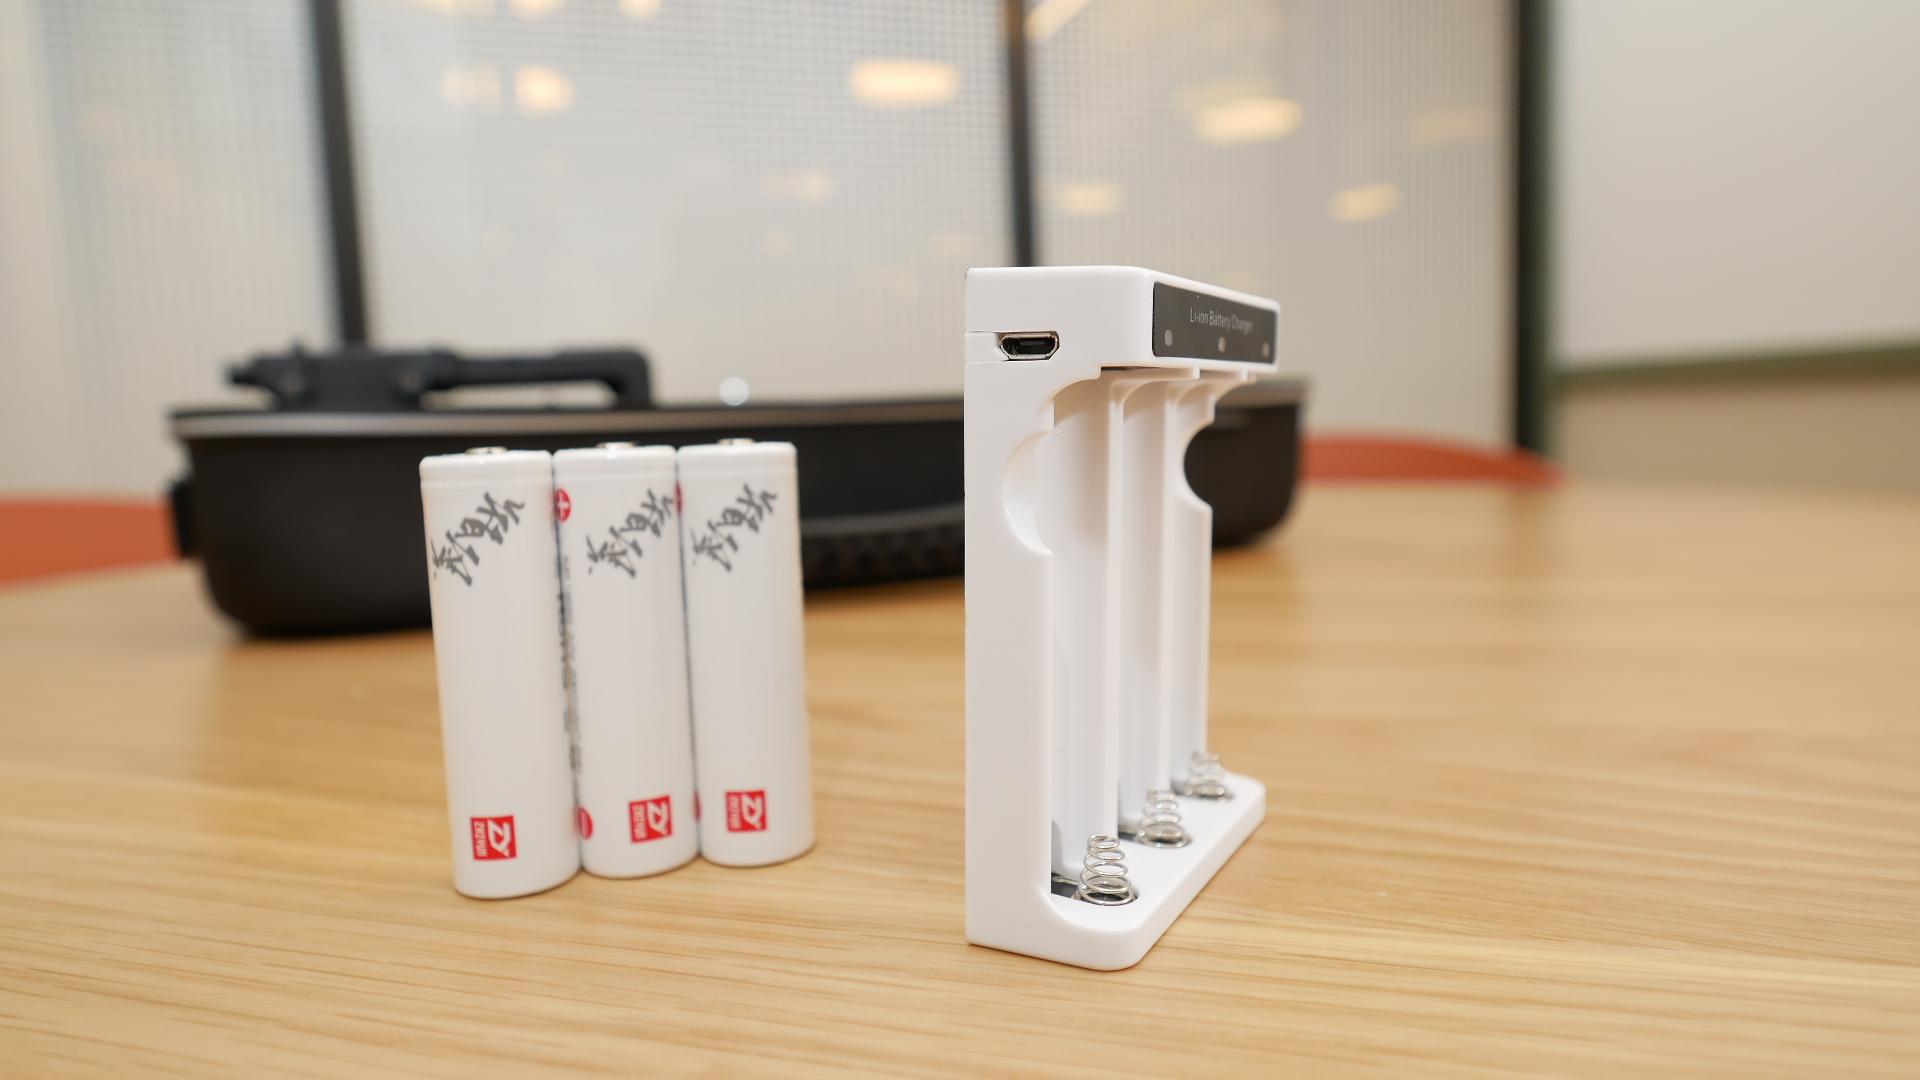 zhiyun crane2 charger